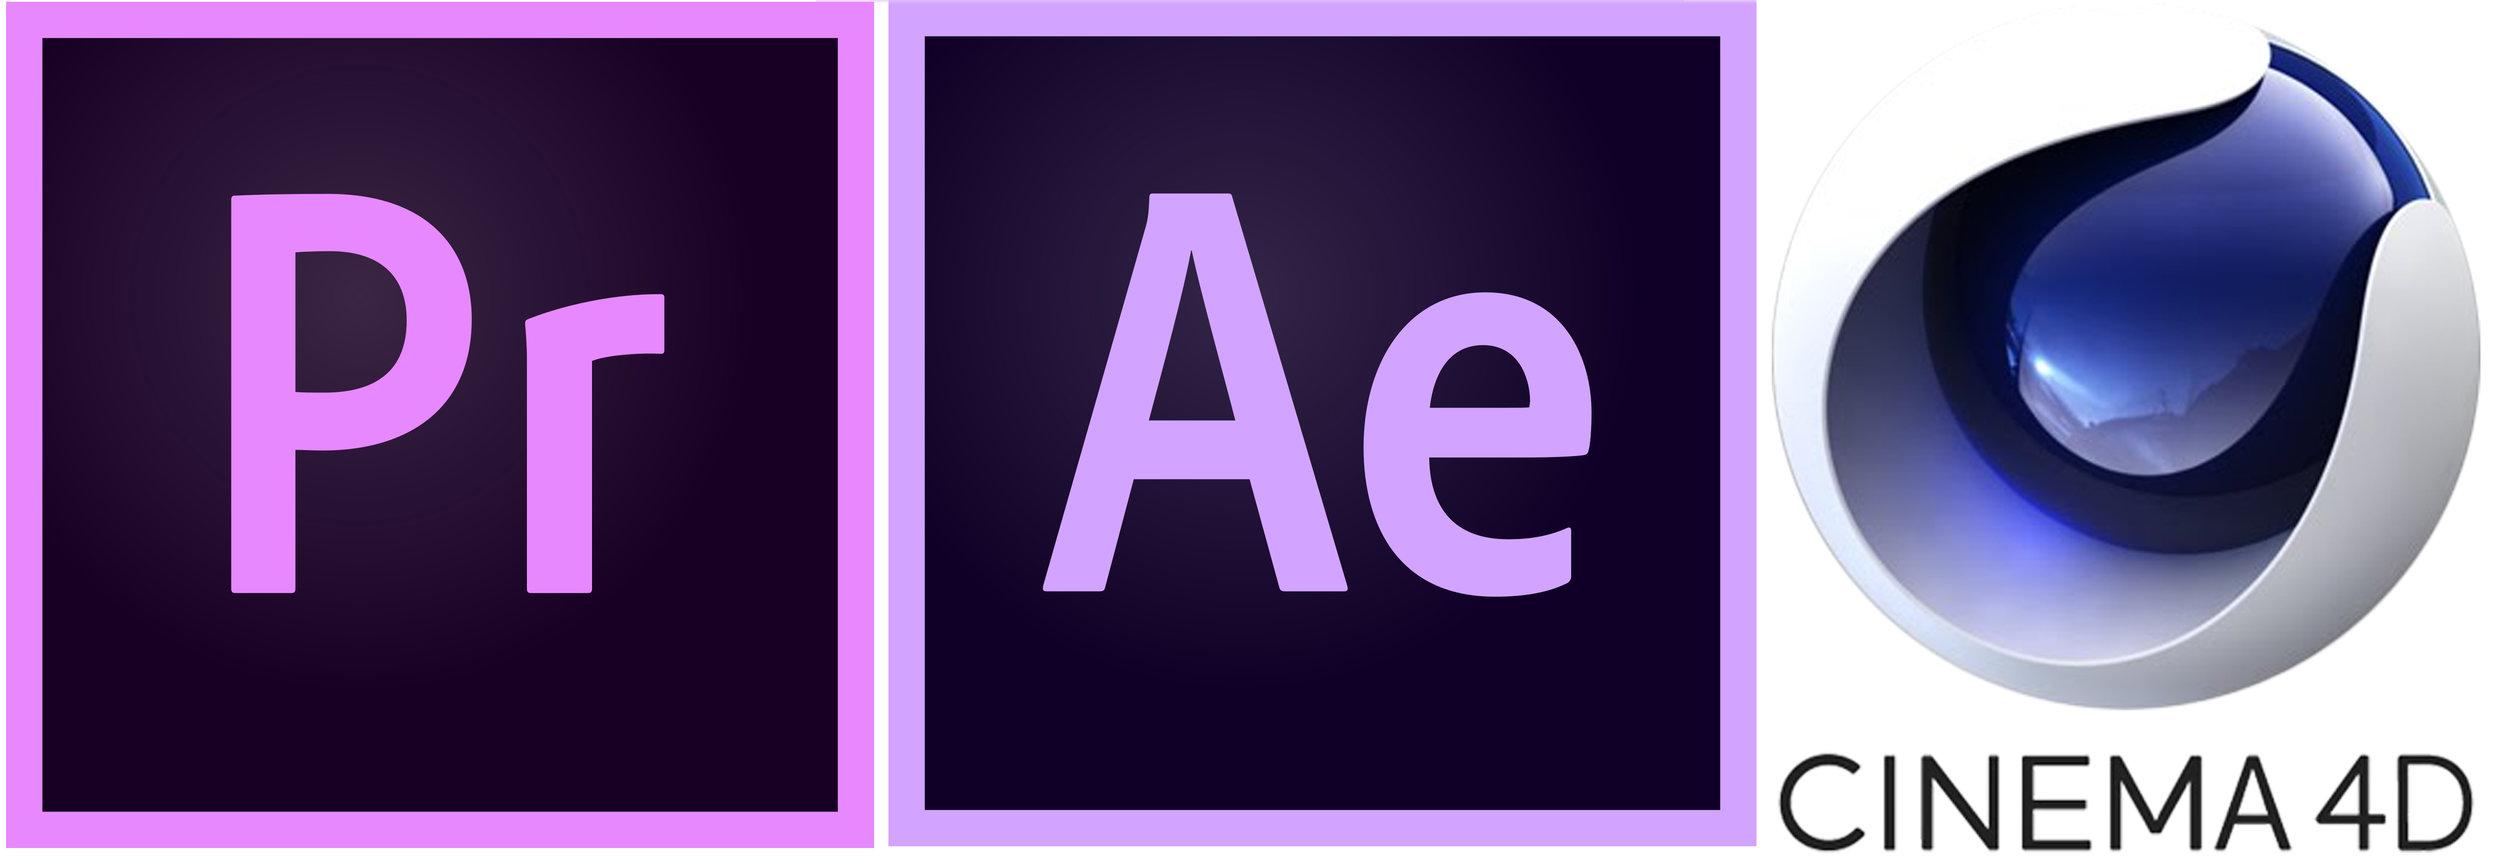 adobe logos.jpg